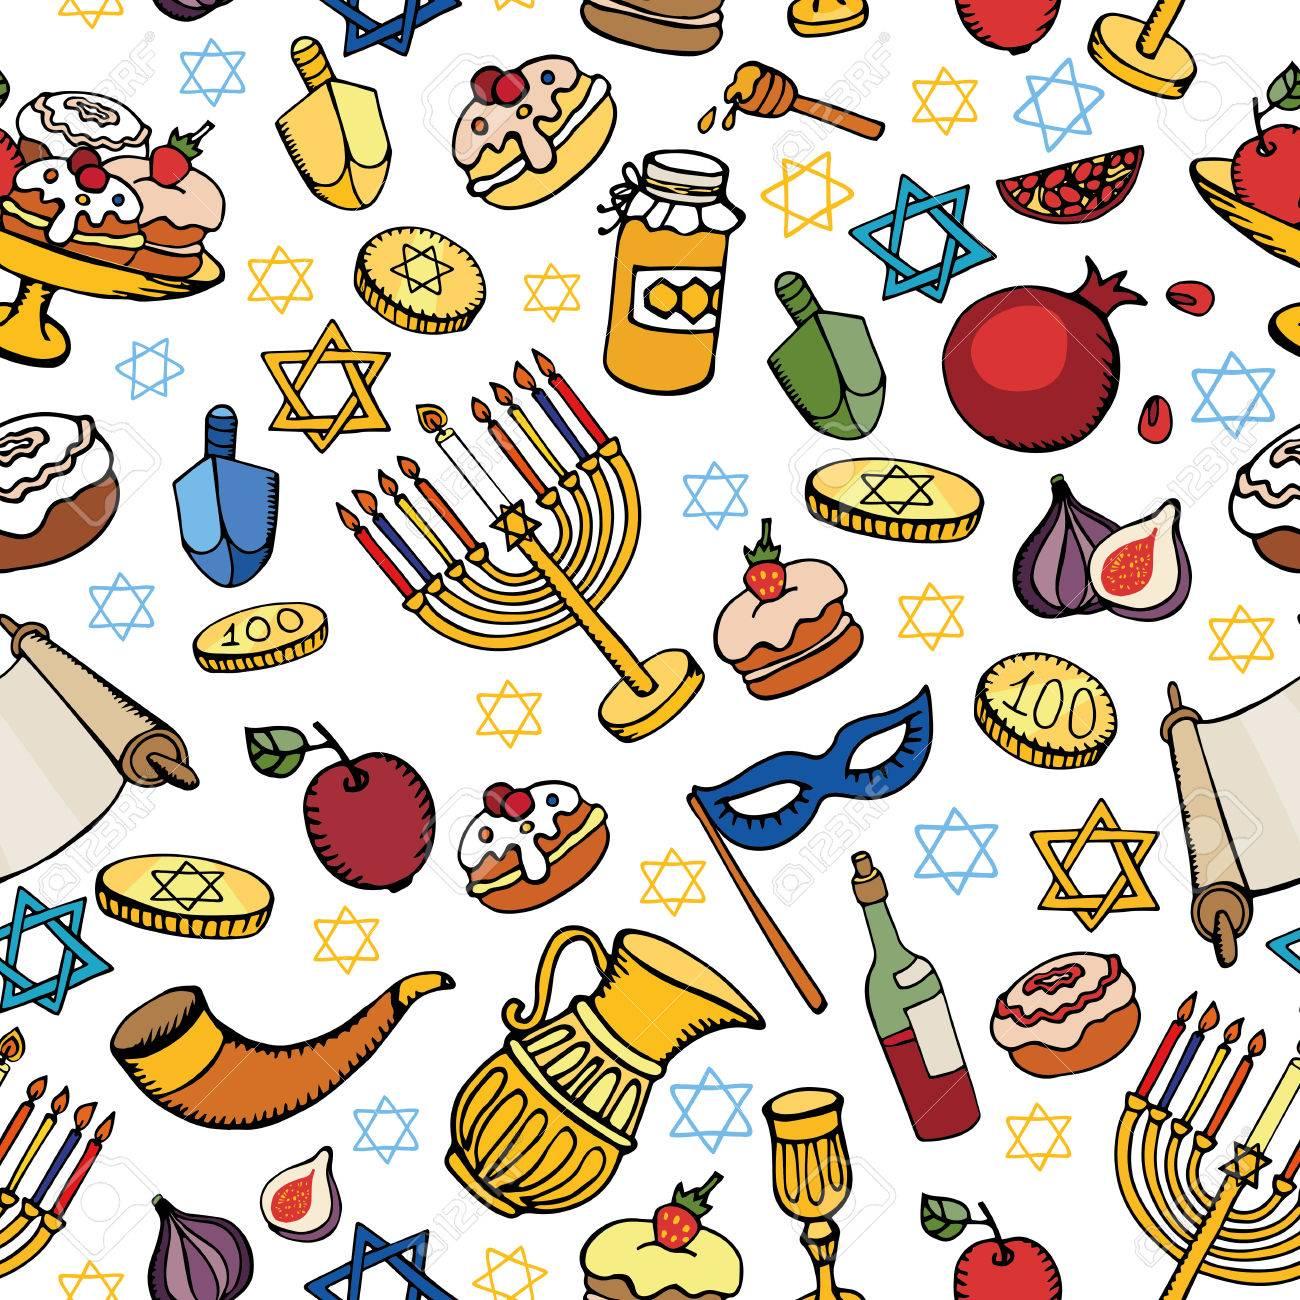 Hanukkah Symbols Seamless Patternodle Hand Drawing Jewish